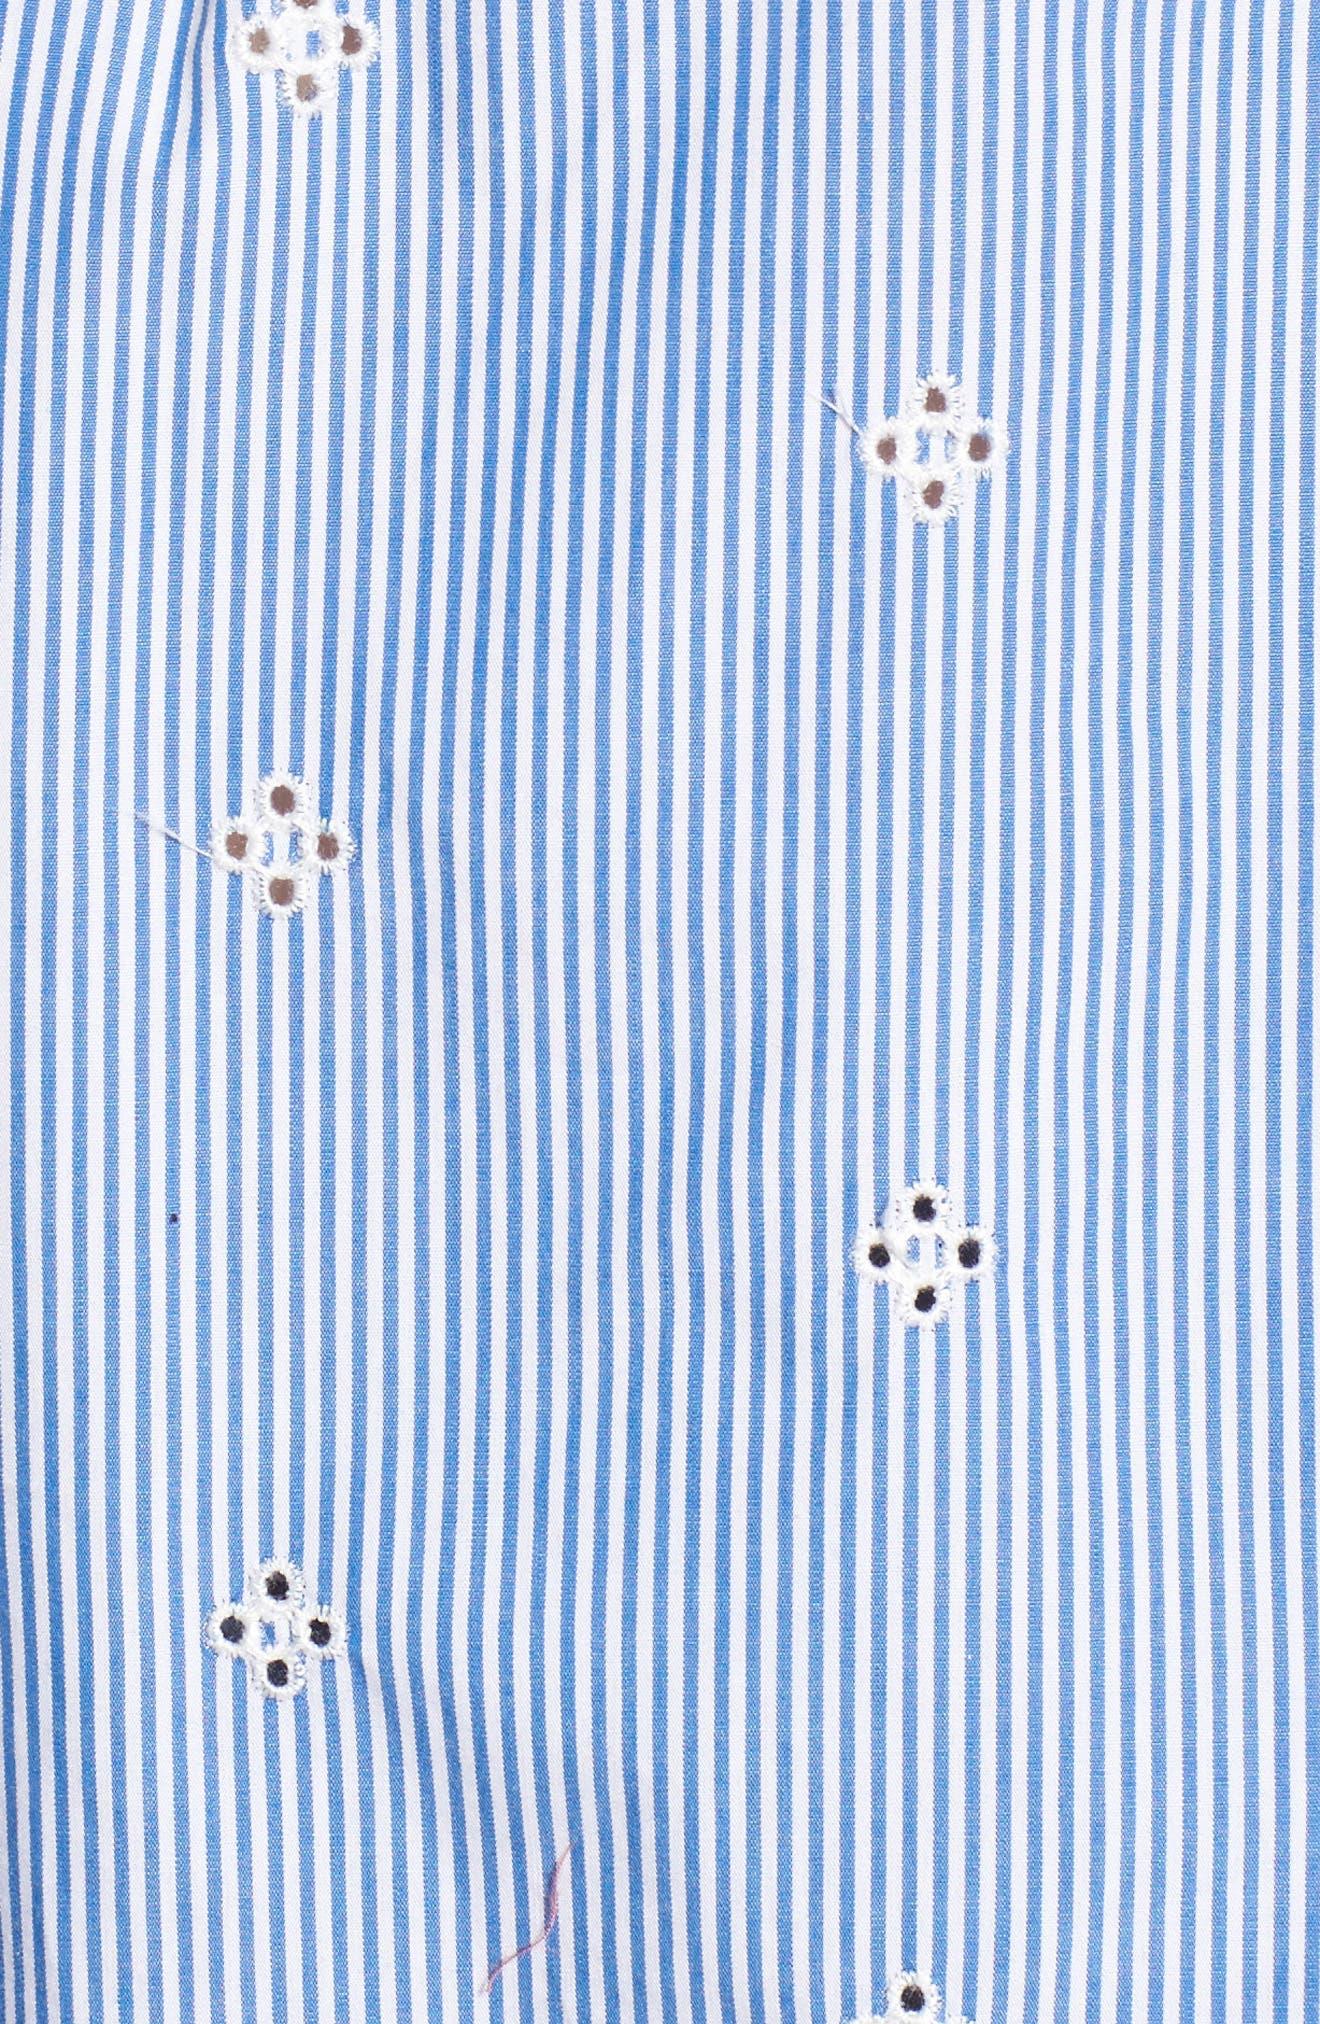 Off the Shoulder Schiffli Smocked Stripe Top,                             Alternate thumbnail 5, color,                             Blue Mazzarine Tawny Stripe